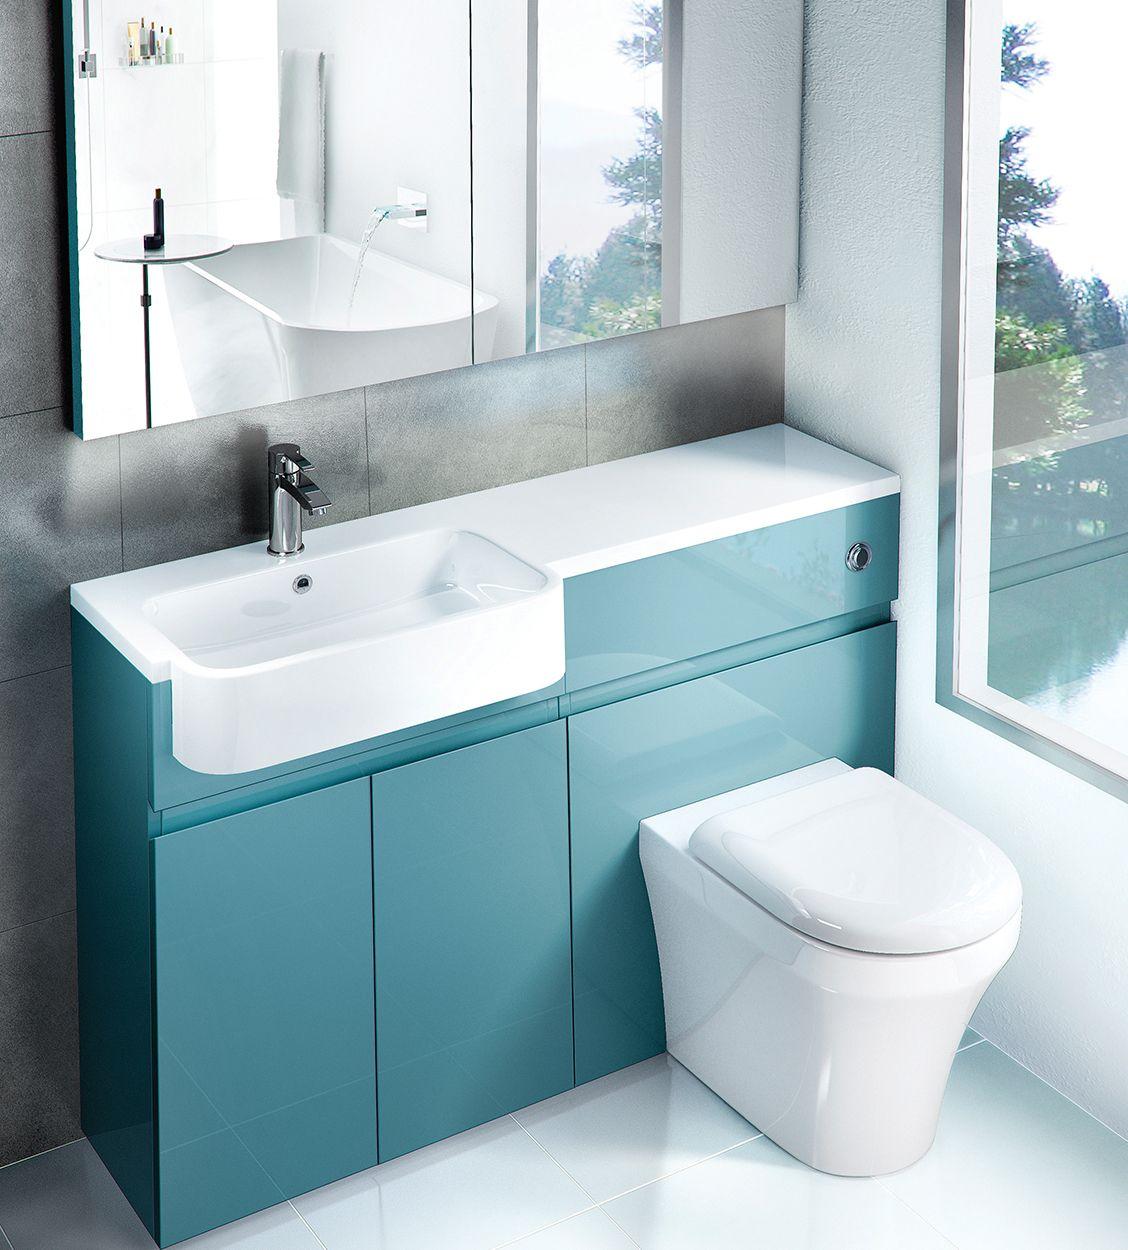 Aqua Cabinets D300 1200mm Fitted Furniture Pack Bathroom Solutions Fitted Bathroom Fitted Bathroom Furniture